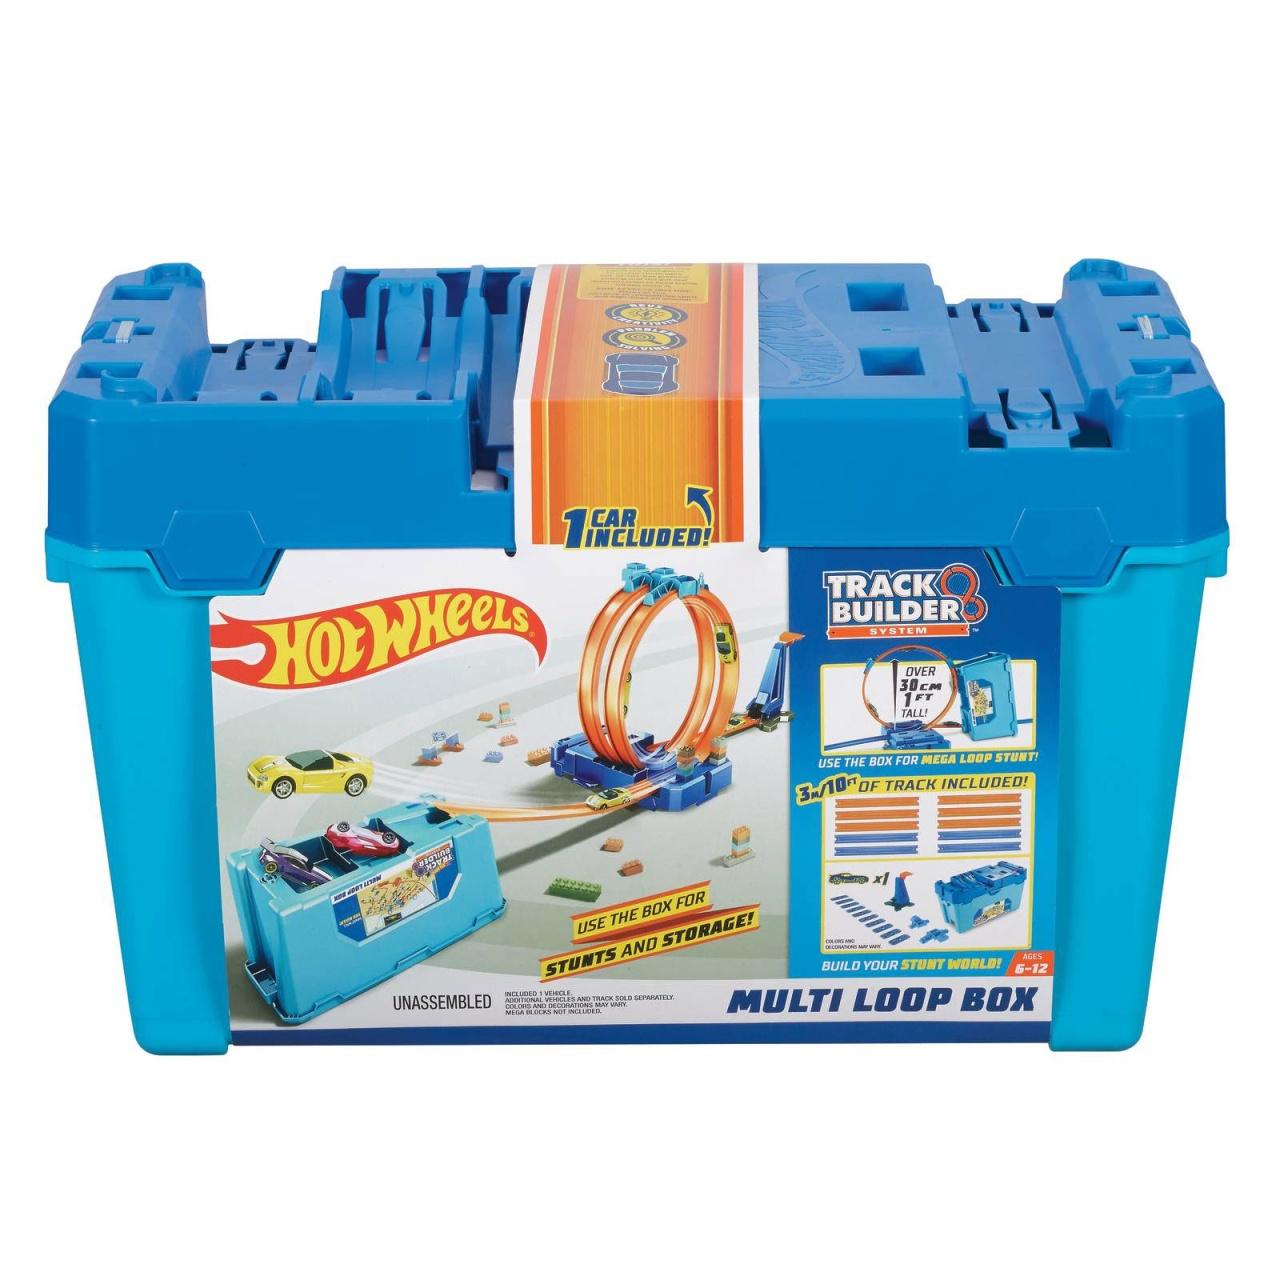 Hot Wheels Track Builder Unlimited Super Multi-Looping Box